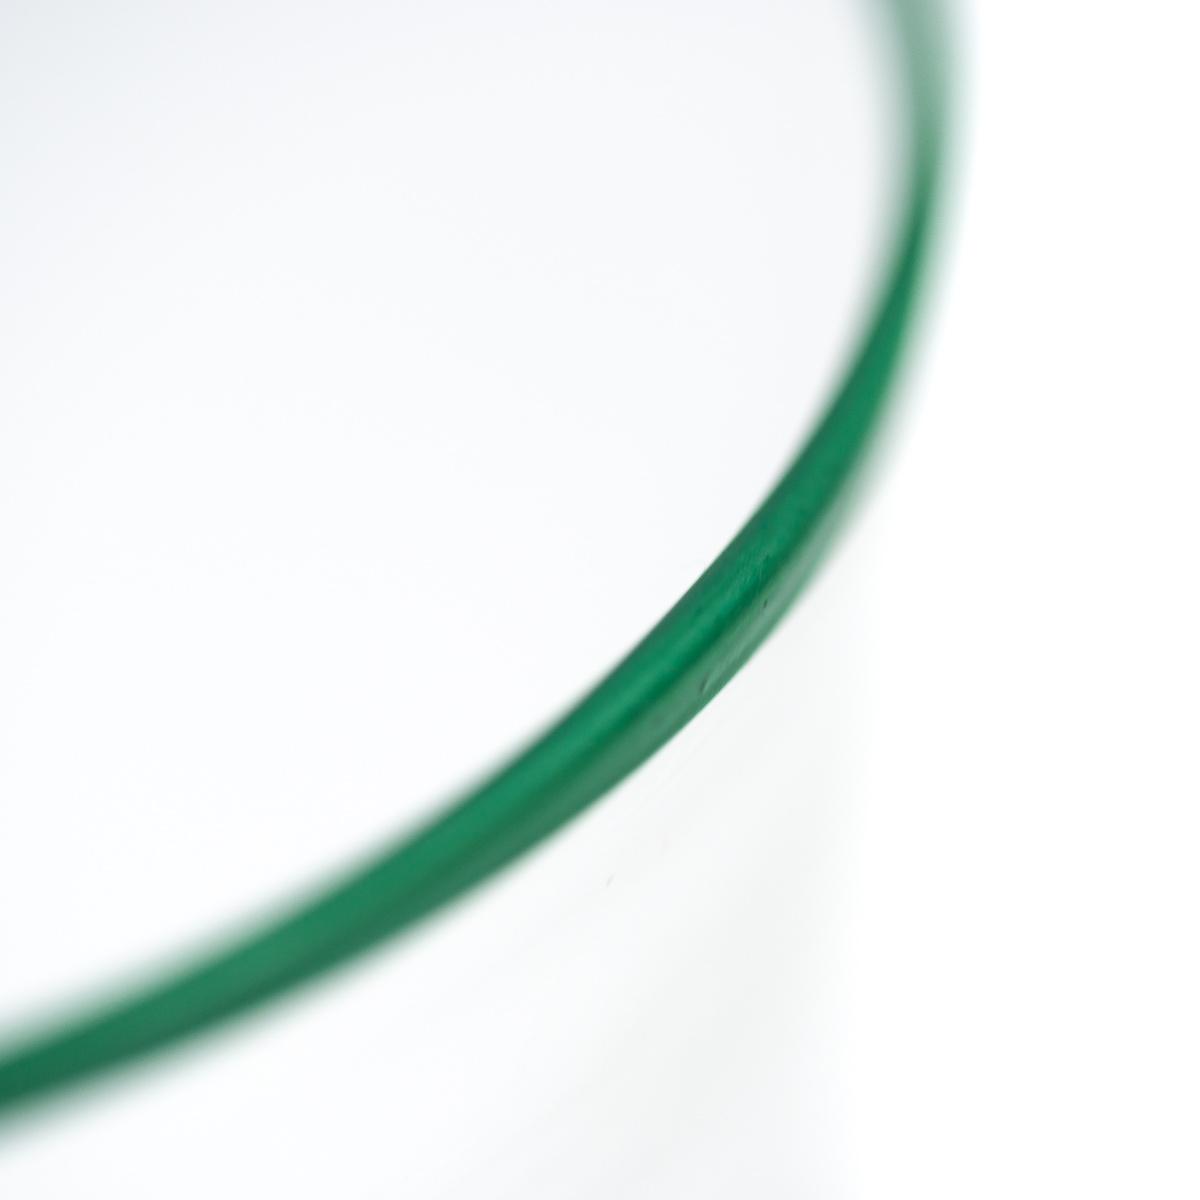 rim-green-glass-luxury-summer